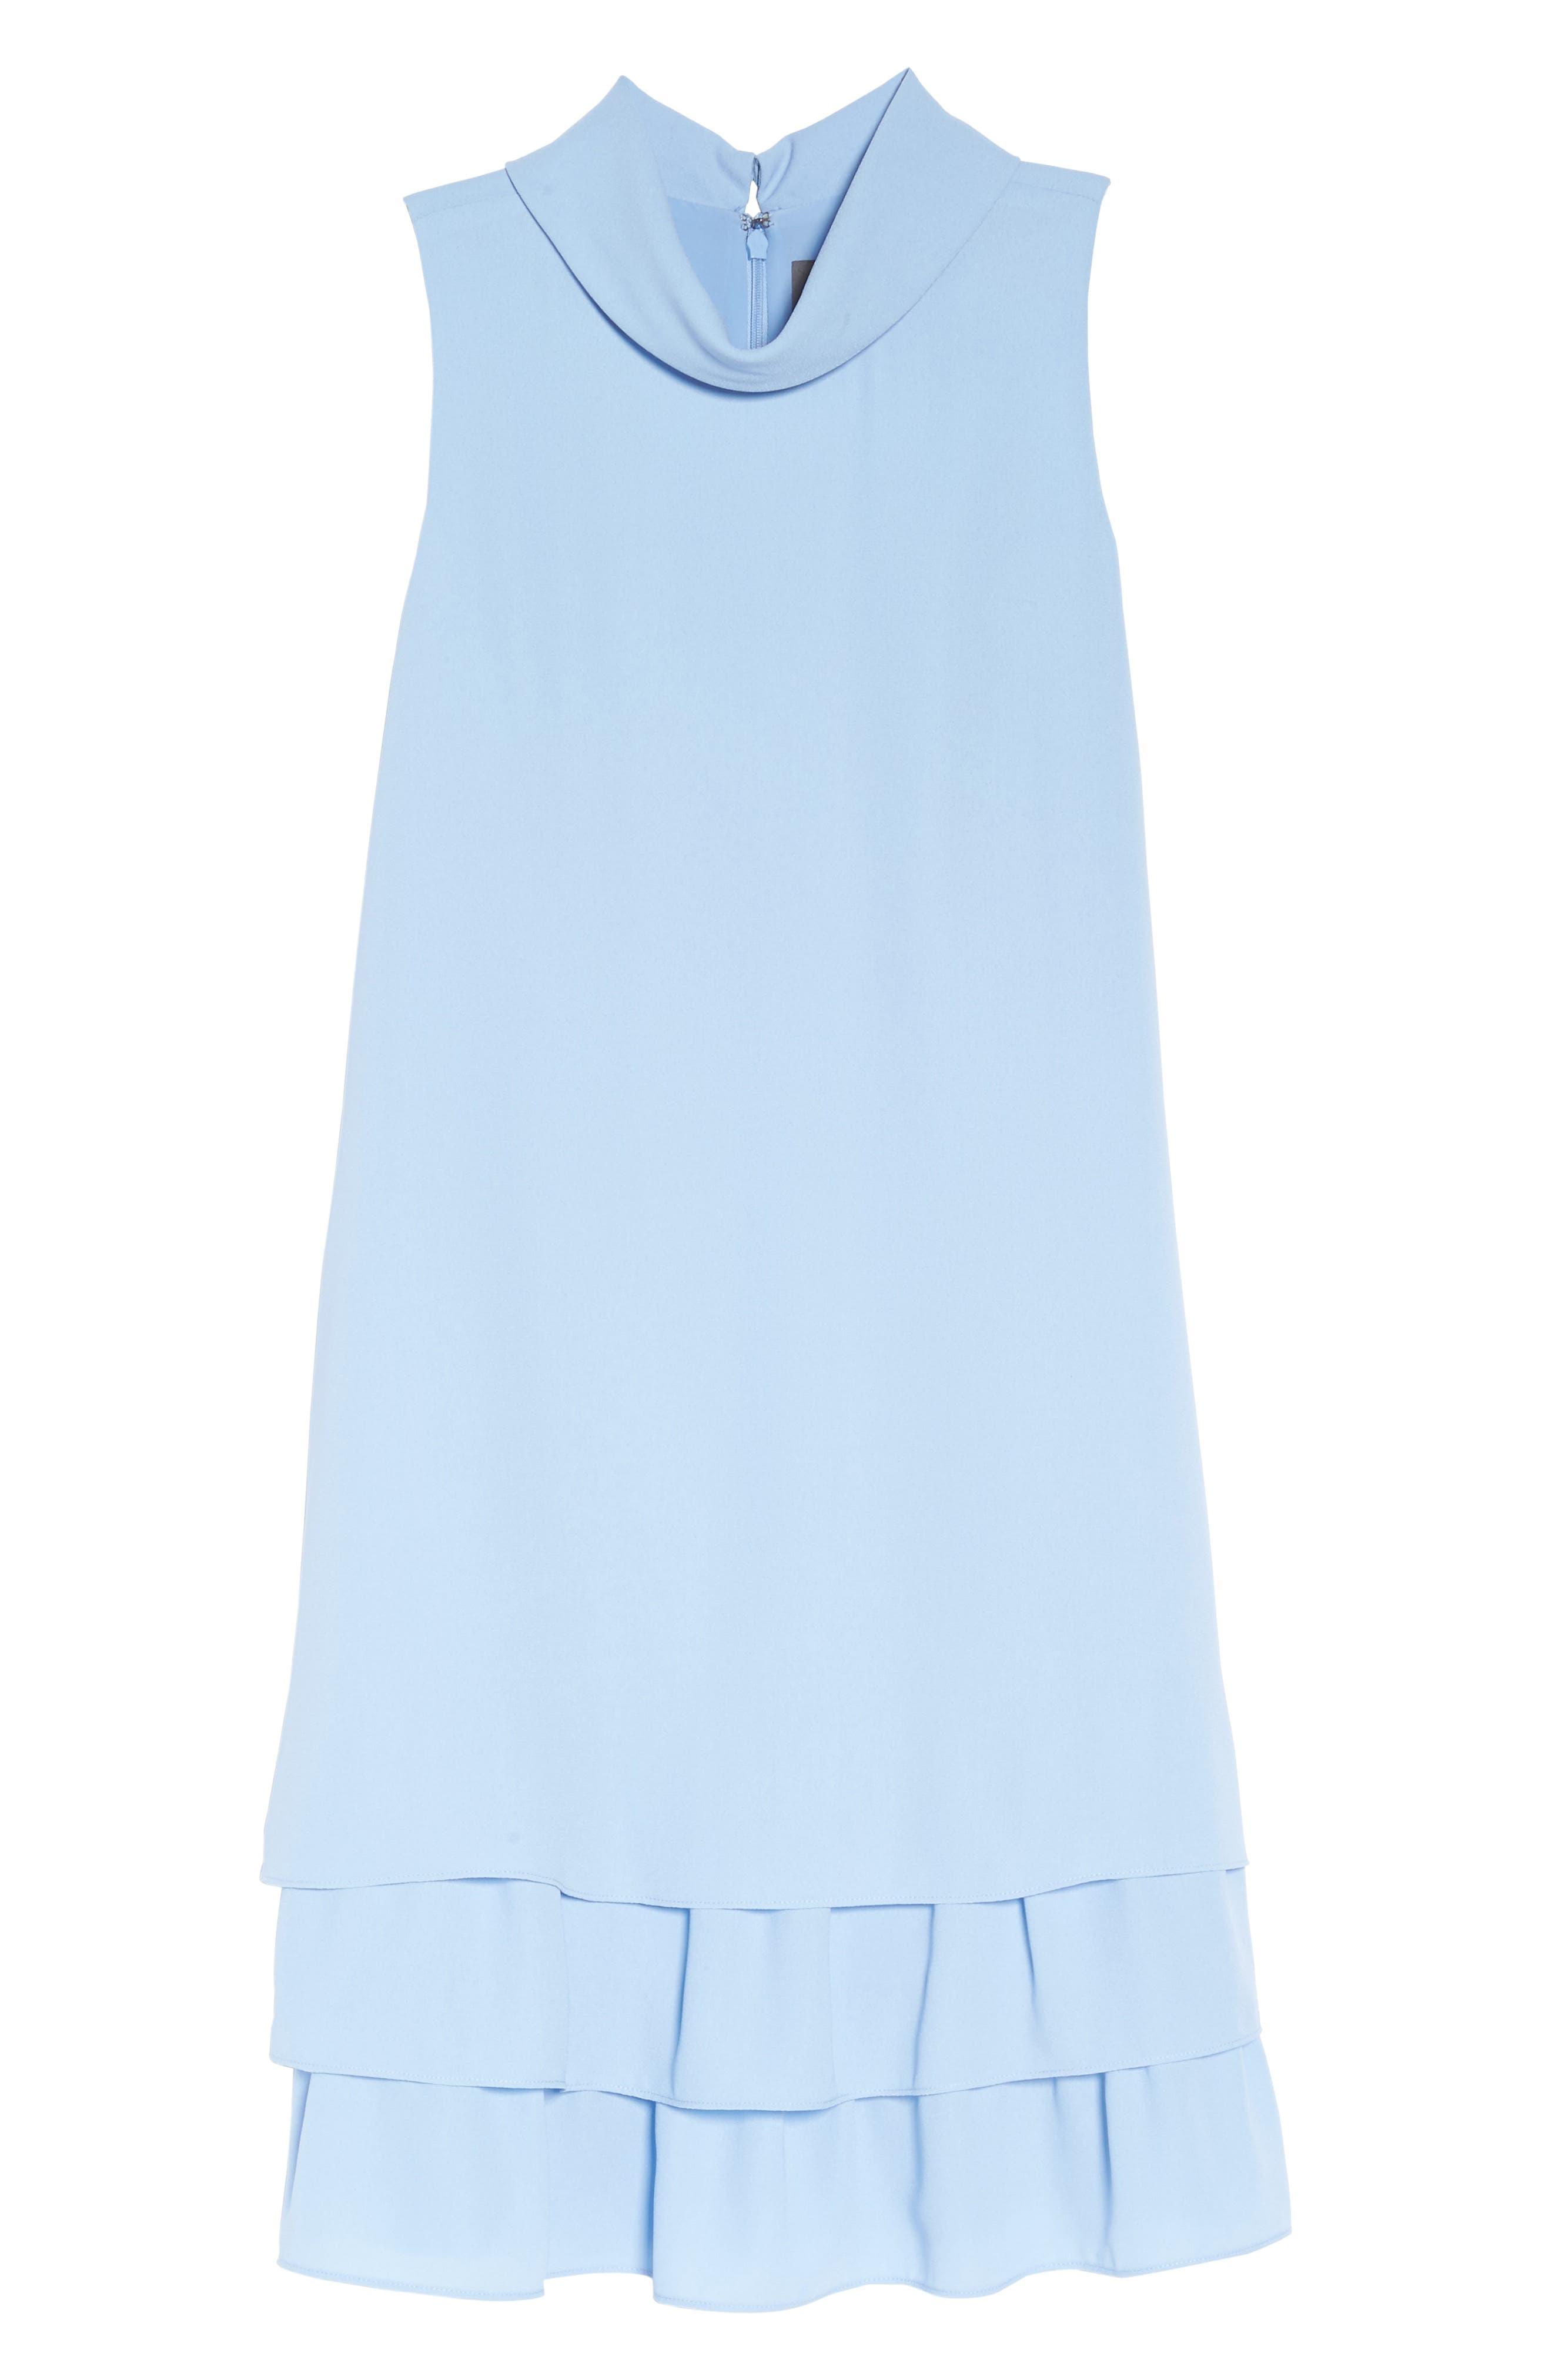 Moss Crepe Roll Neck Ruffle Dress,                             Alternate thumbnail 6, color,                             Light Blue